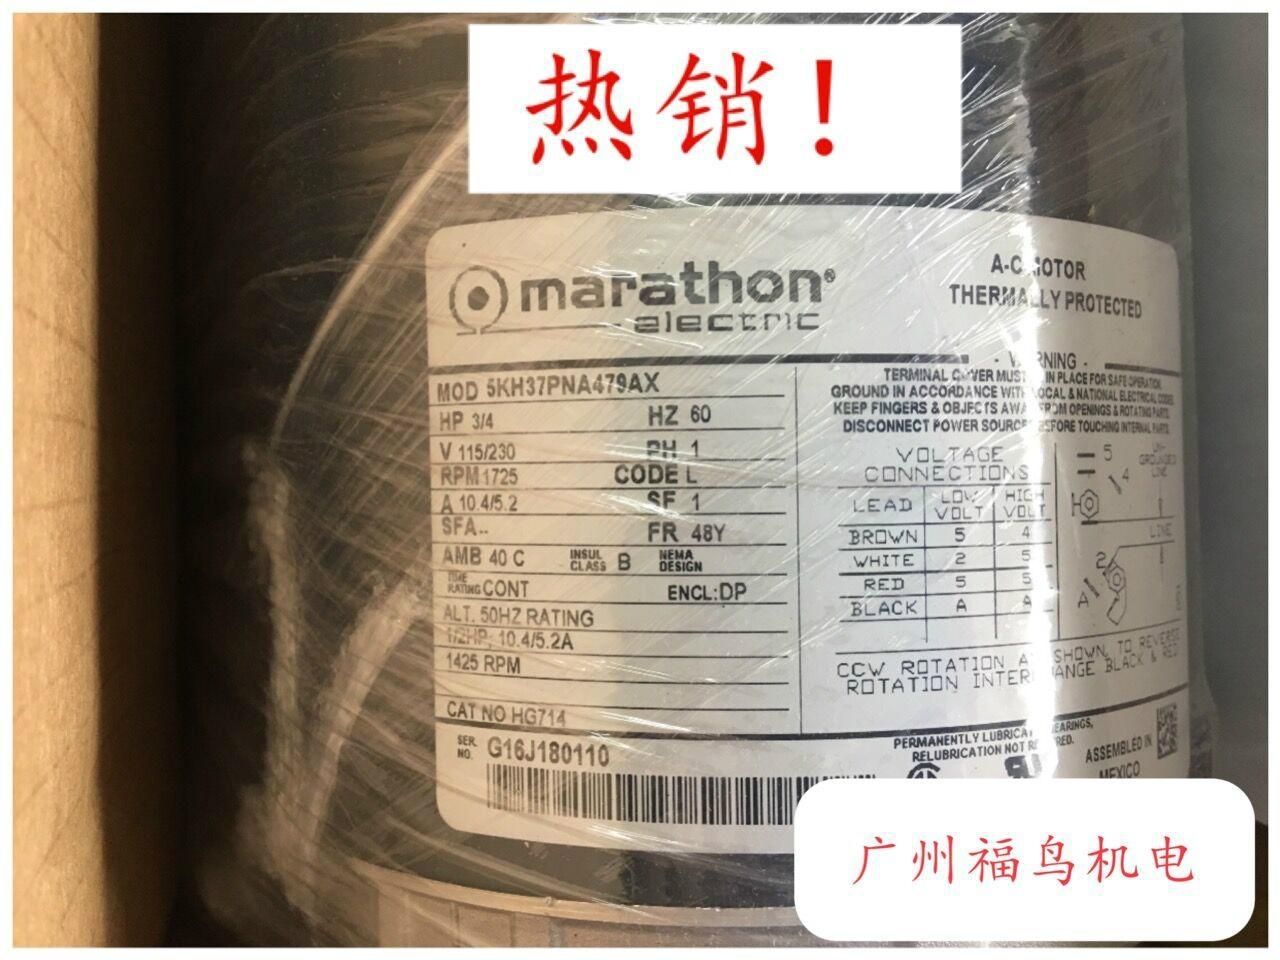 MARATHON電機, 型號: 5KH37PNA479AX